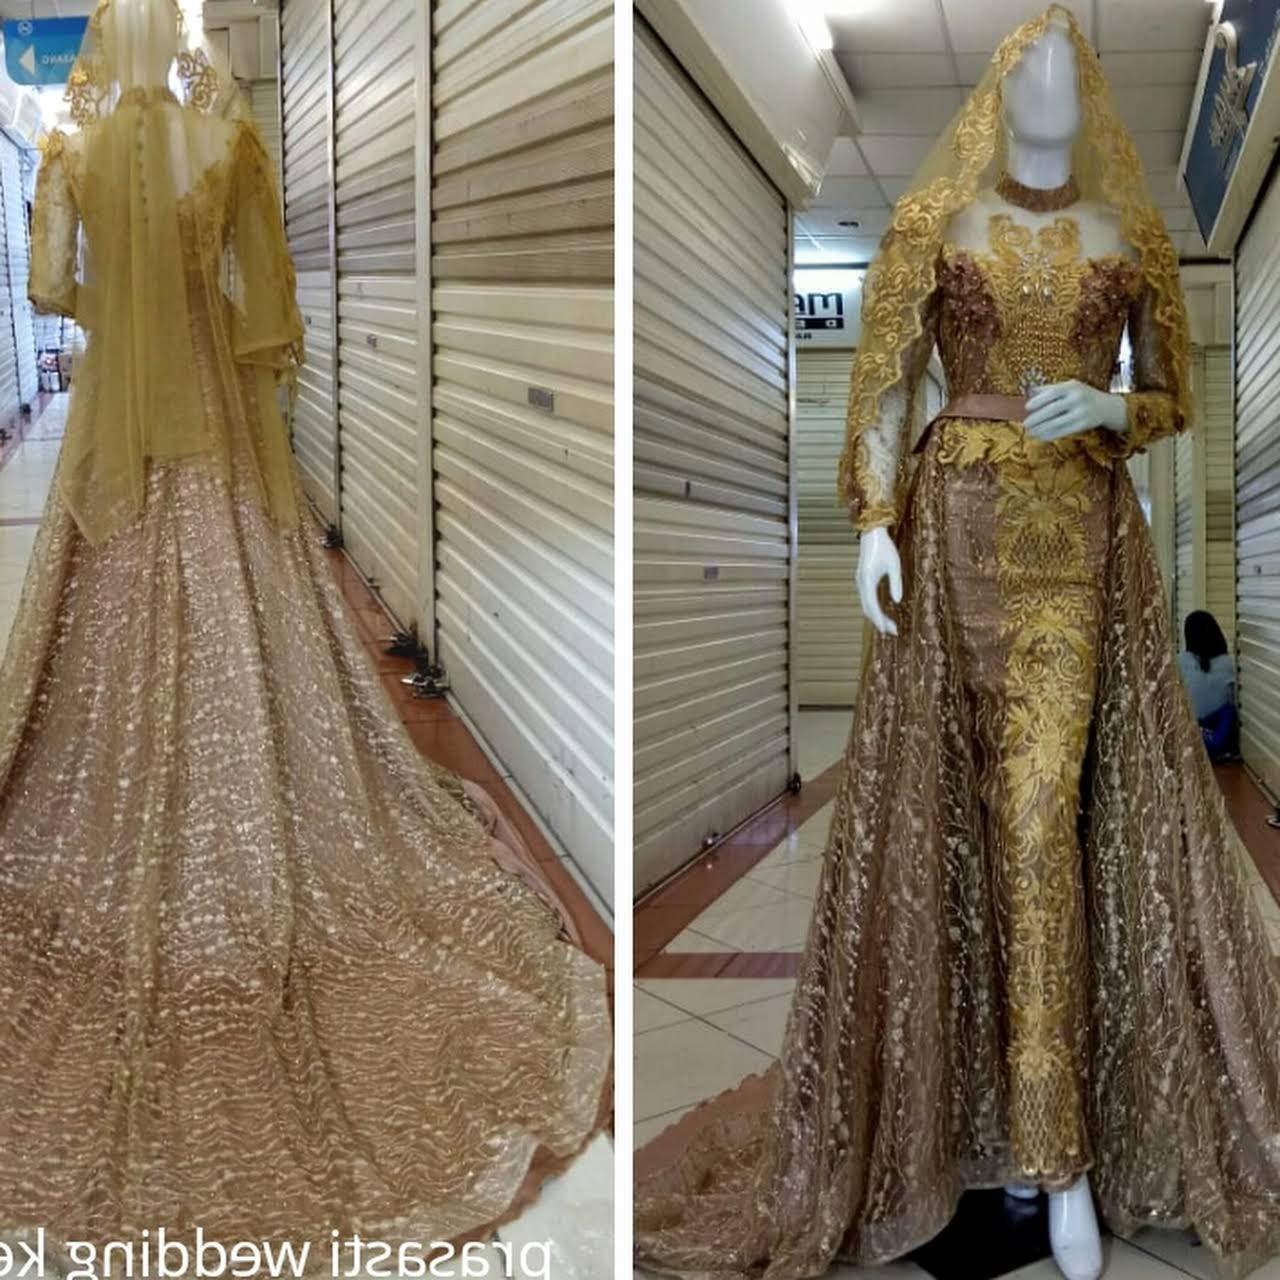 Model Sewa Baju Pengantin Muslimah Tangerang 3ldq Gaun Kebaya Pengantin Muslimah Hijab Syari Layanan Belanja